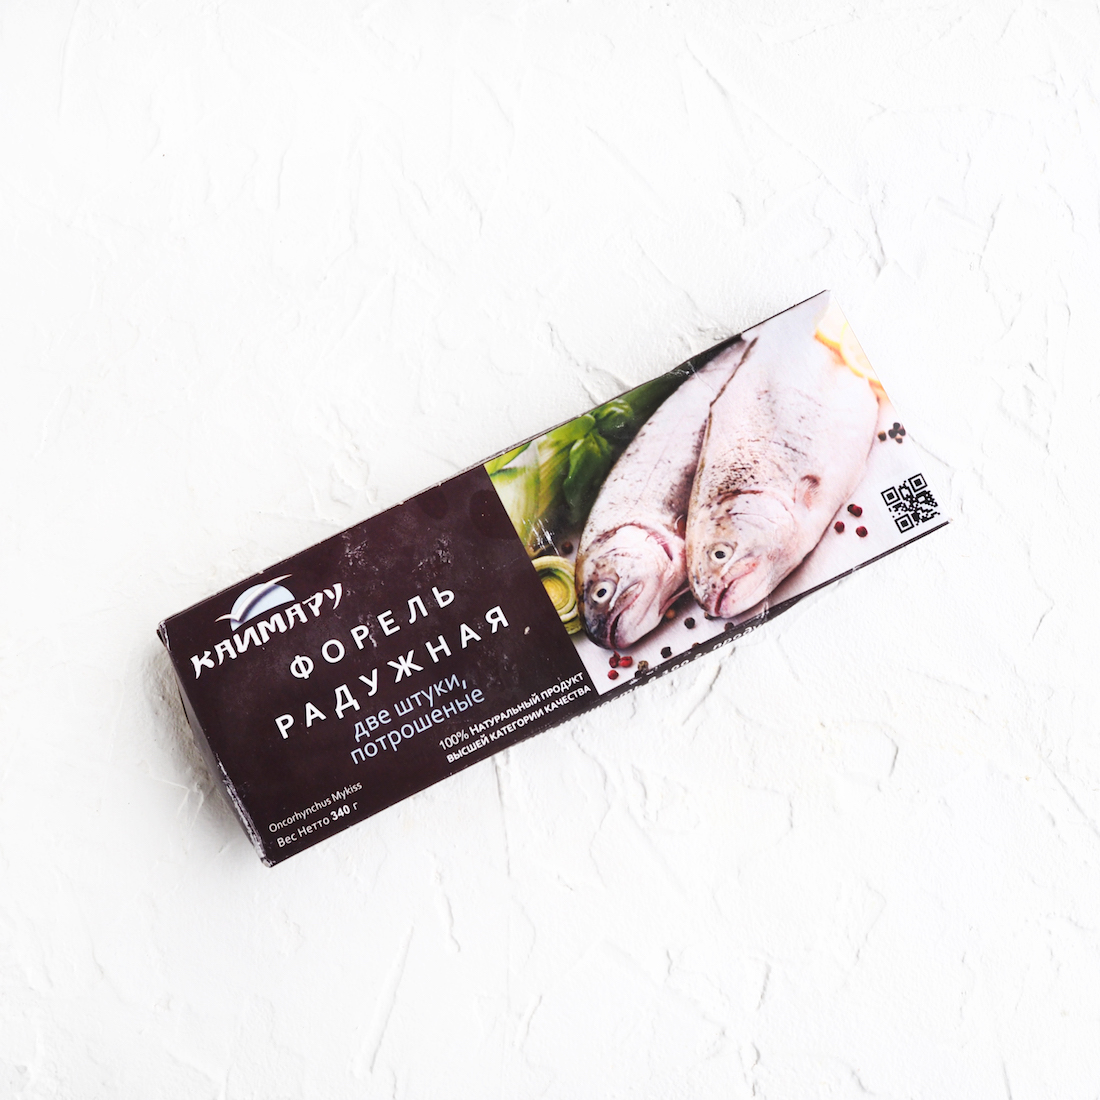 Замороженная радужная форель (2 шт., 340 г)